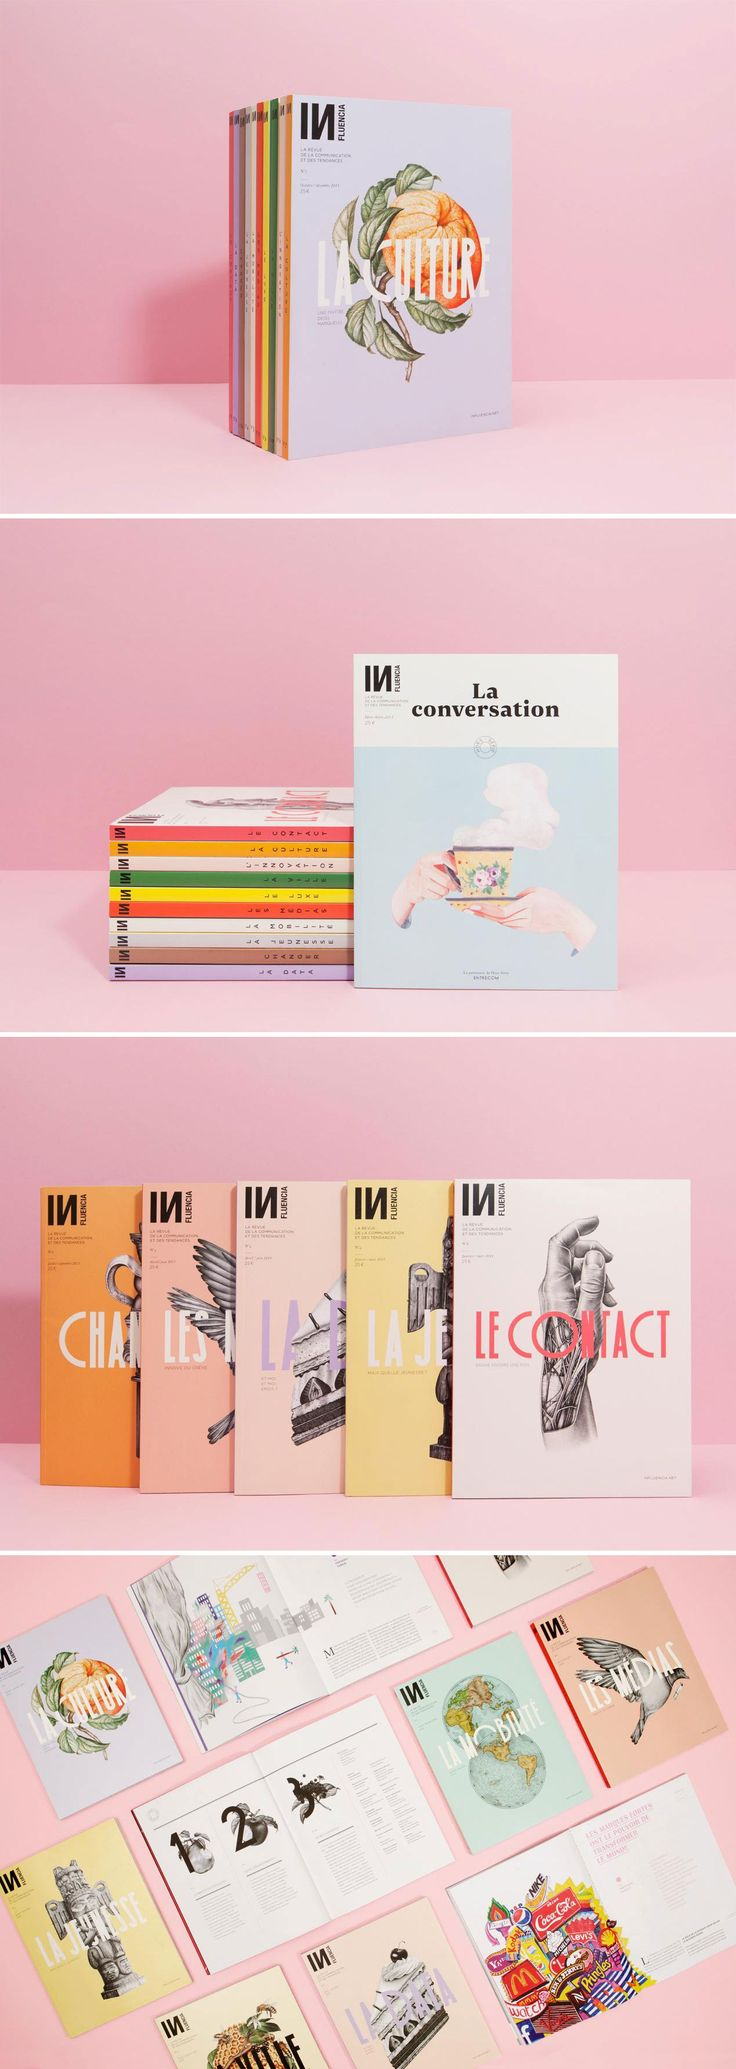 INfluencia - a serie of covers   Violaine & Jérémy